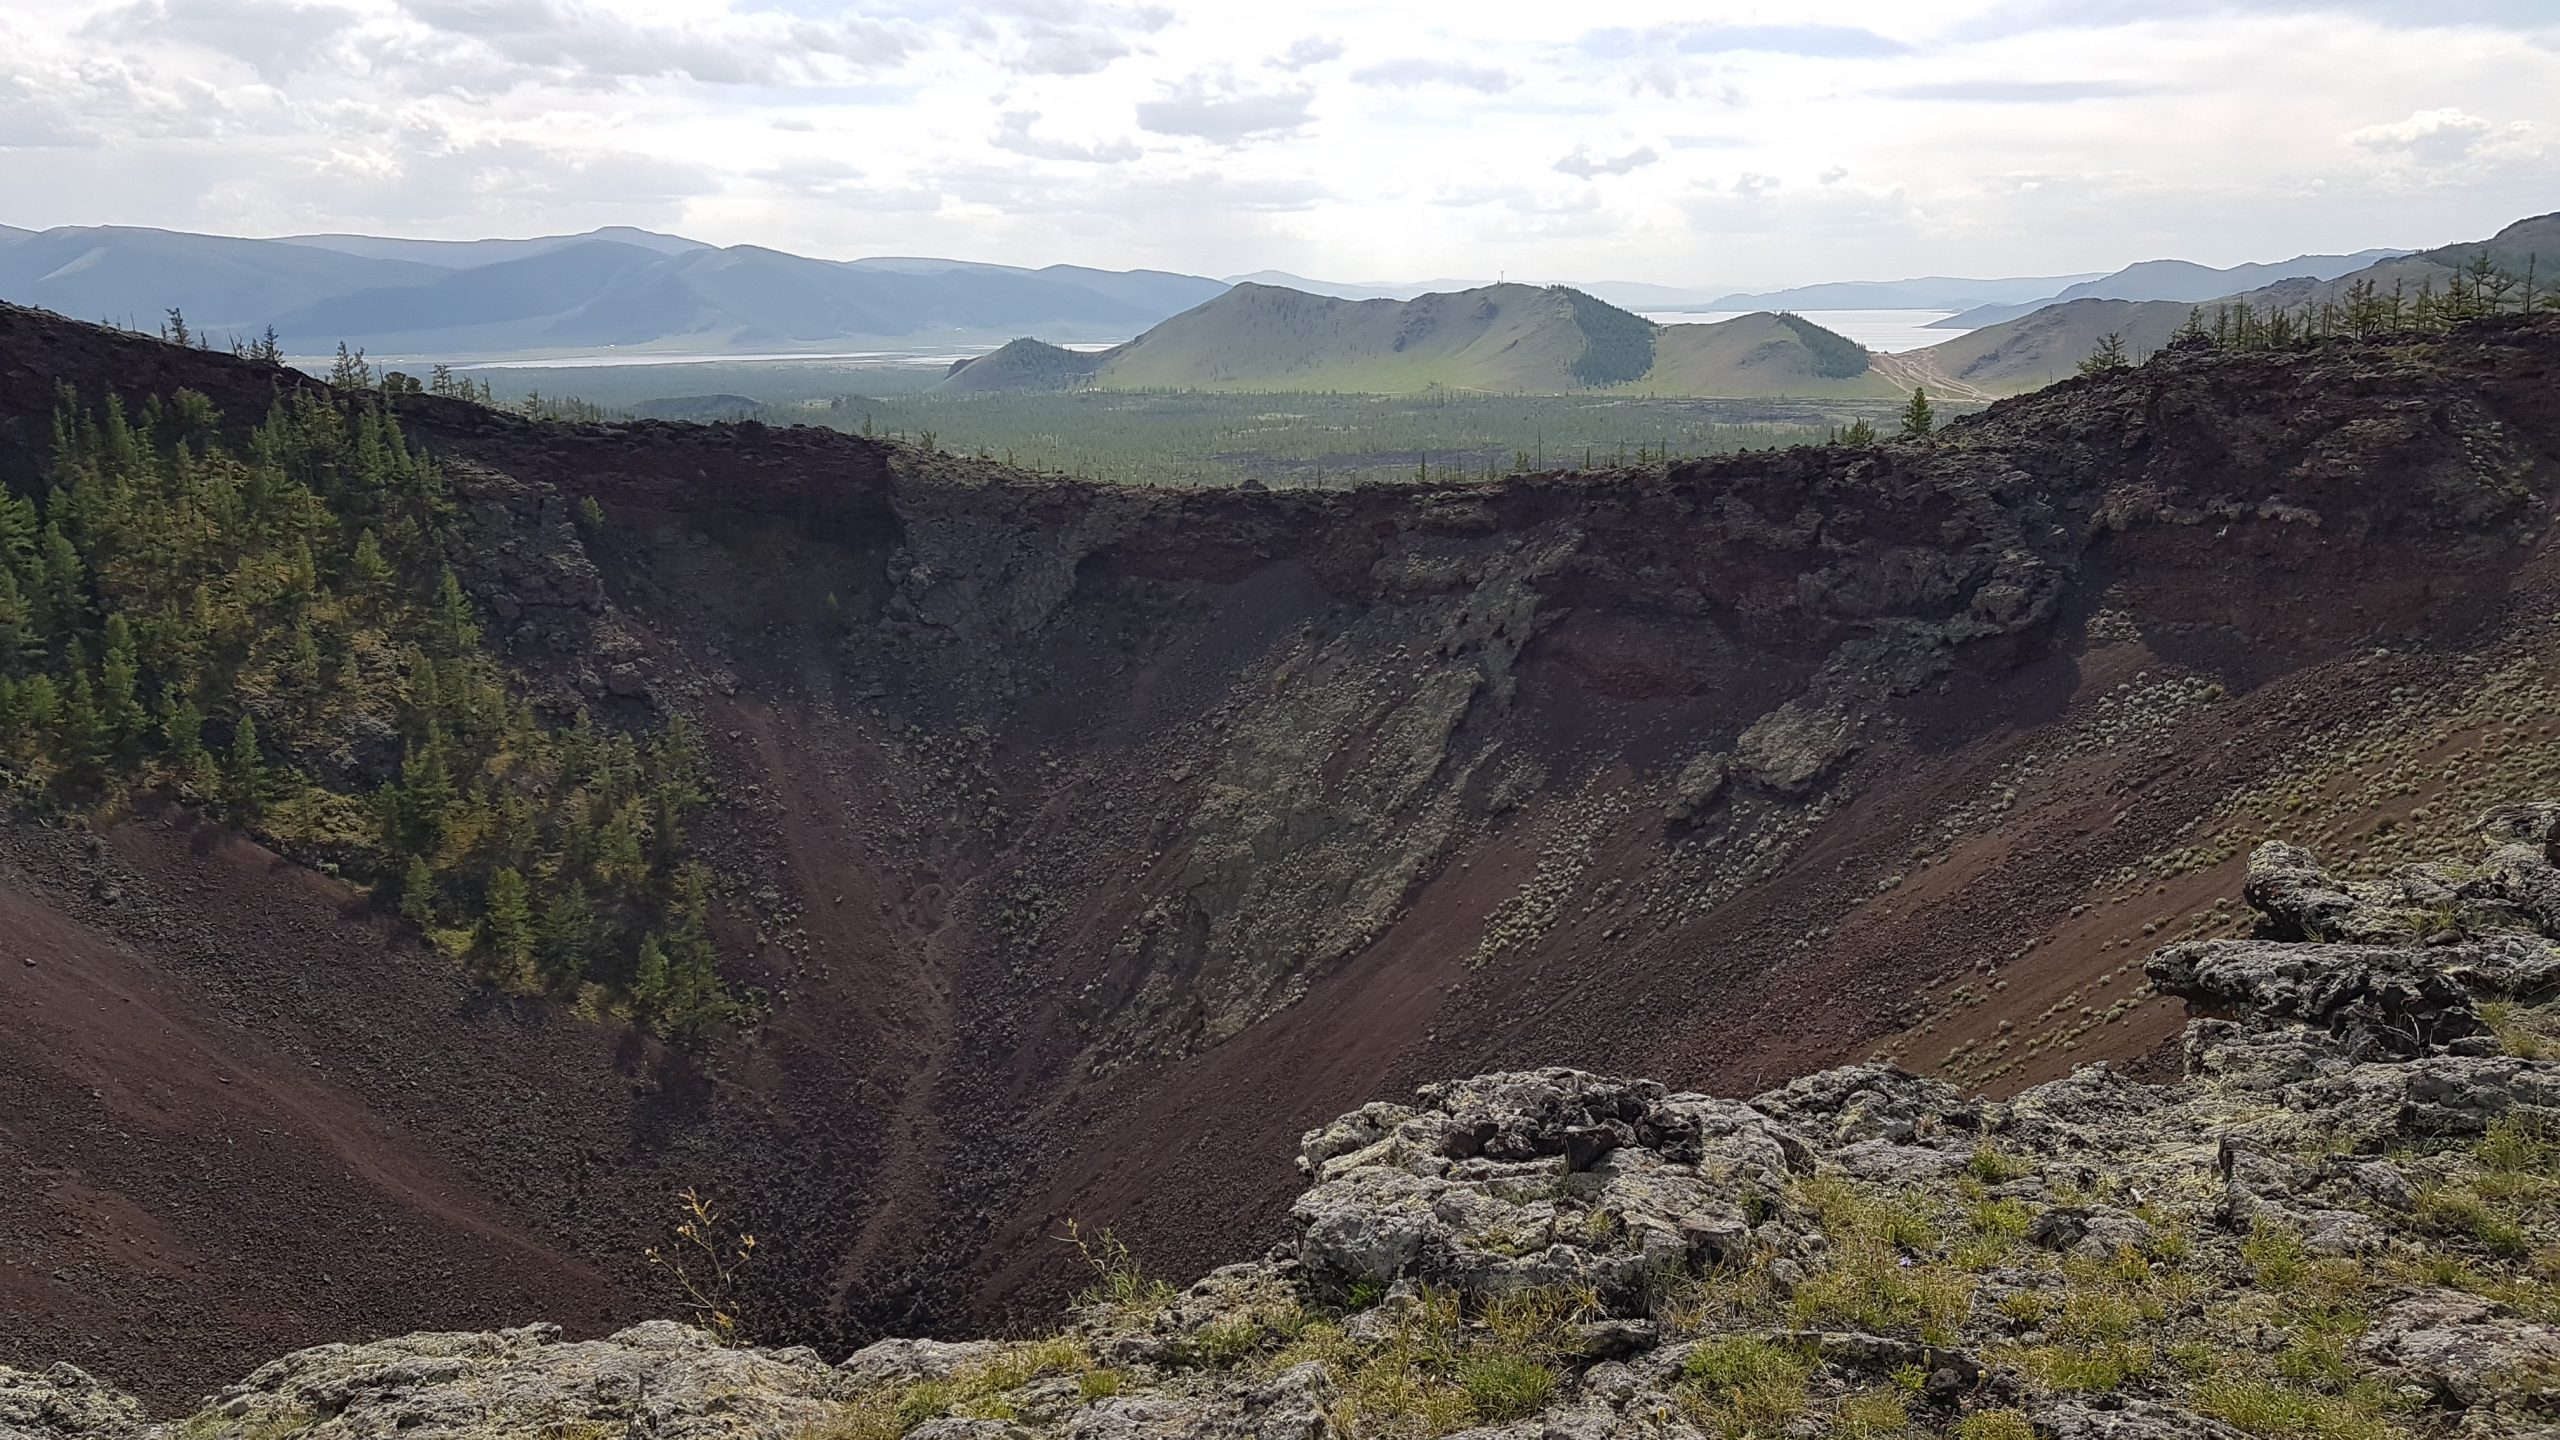 24 juillet : Le volcan Khorgo